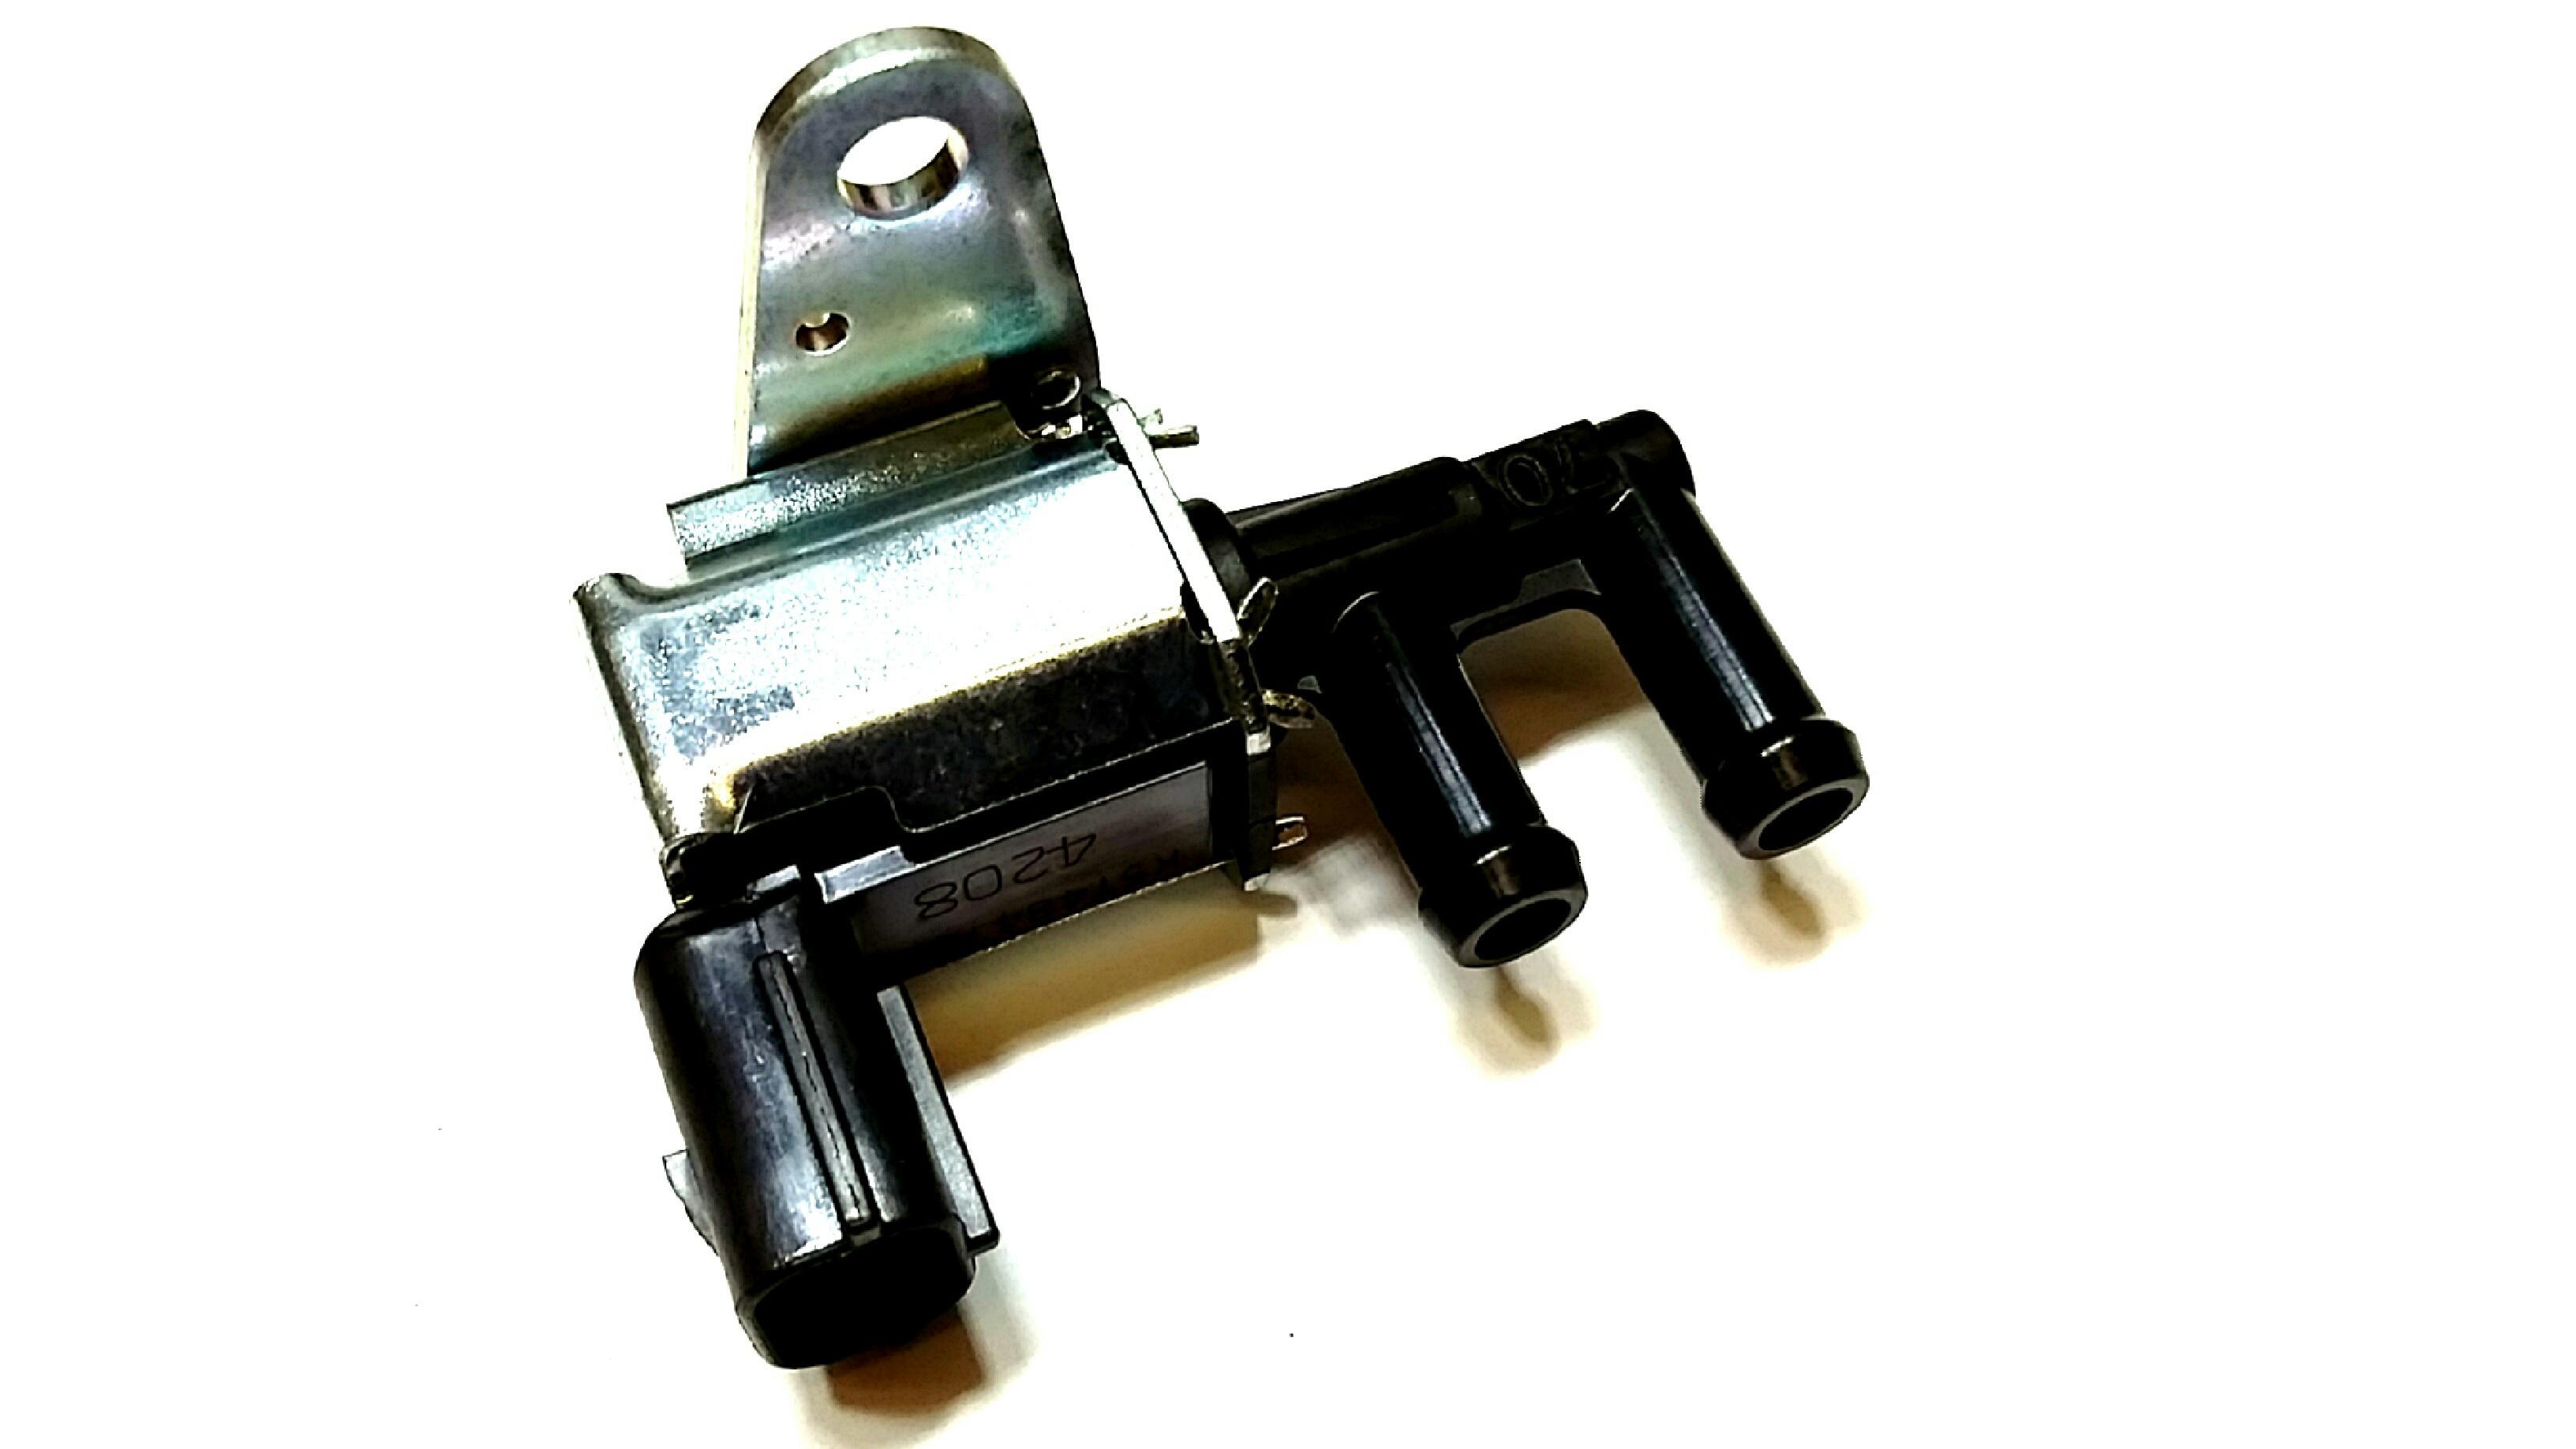 16102aa450 subaru valve assembly duty solenoid liberty subaru automatic transmission diagram subaru automatic transmission diagram subaru automatic transmission diagram subaru automatic transmission diagram